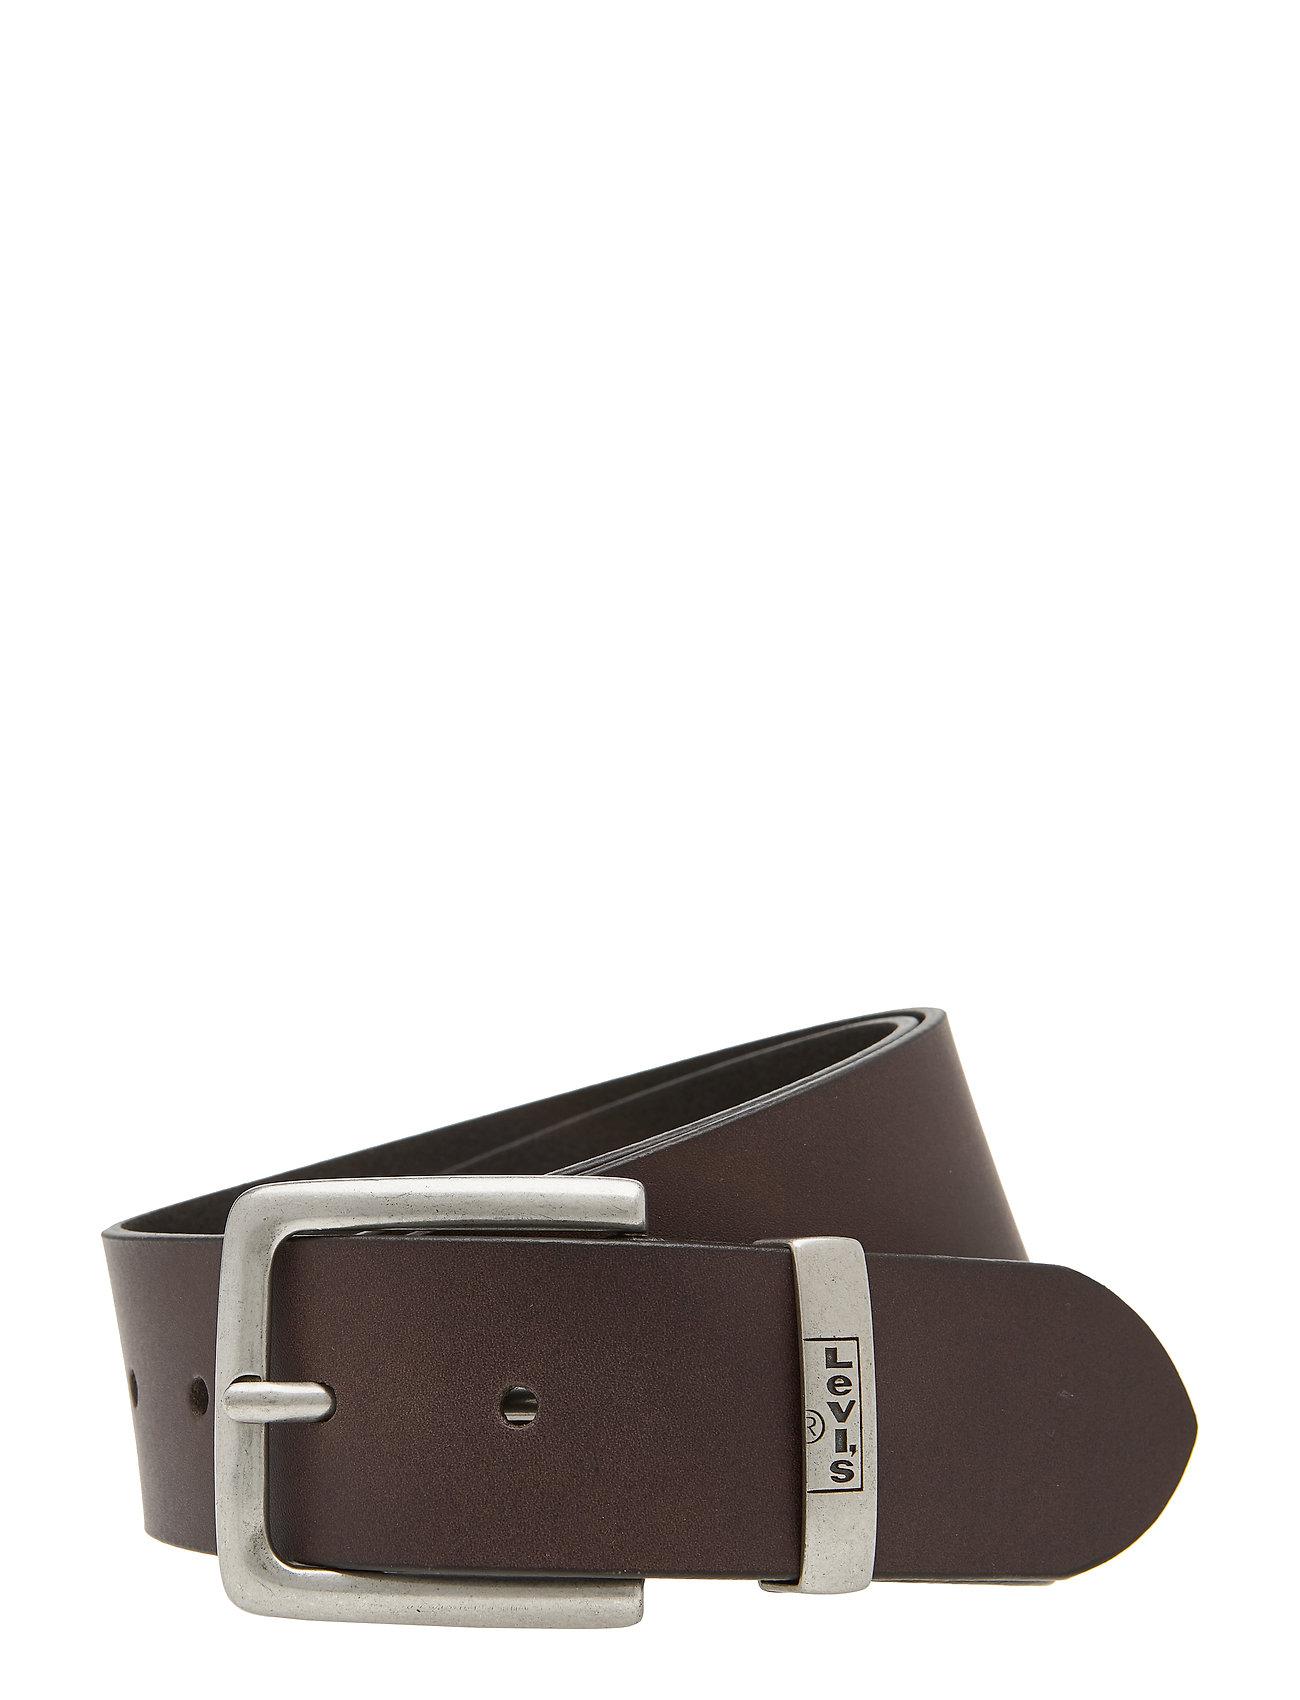 Levi's Footwear & Acc - NEW ALBERT - paski klasyczne - dark brown - 0